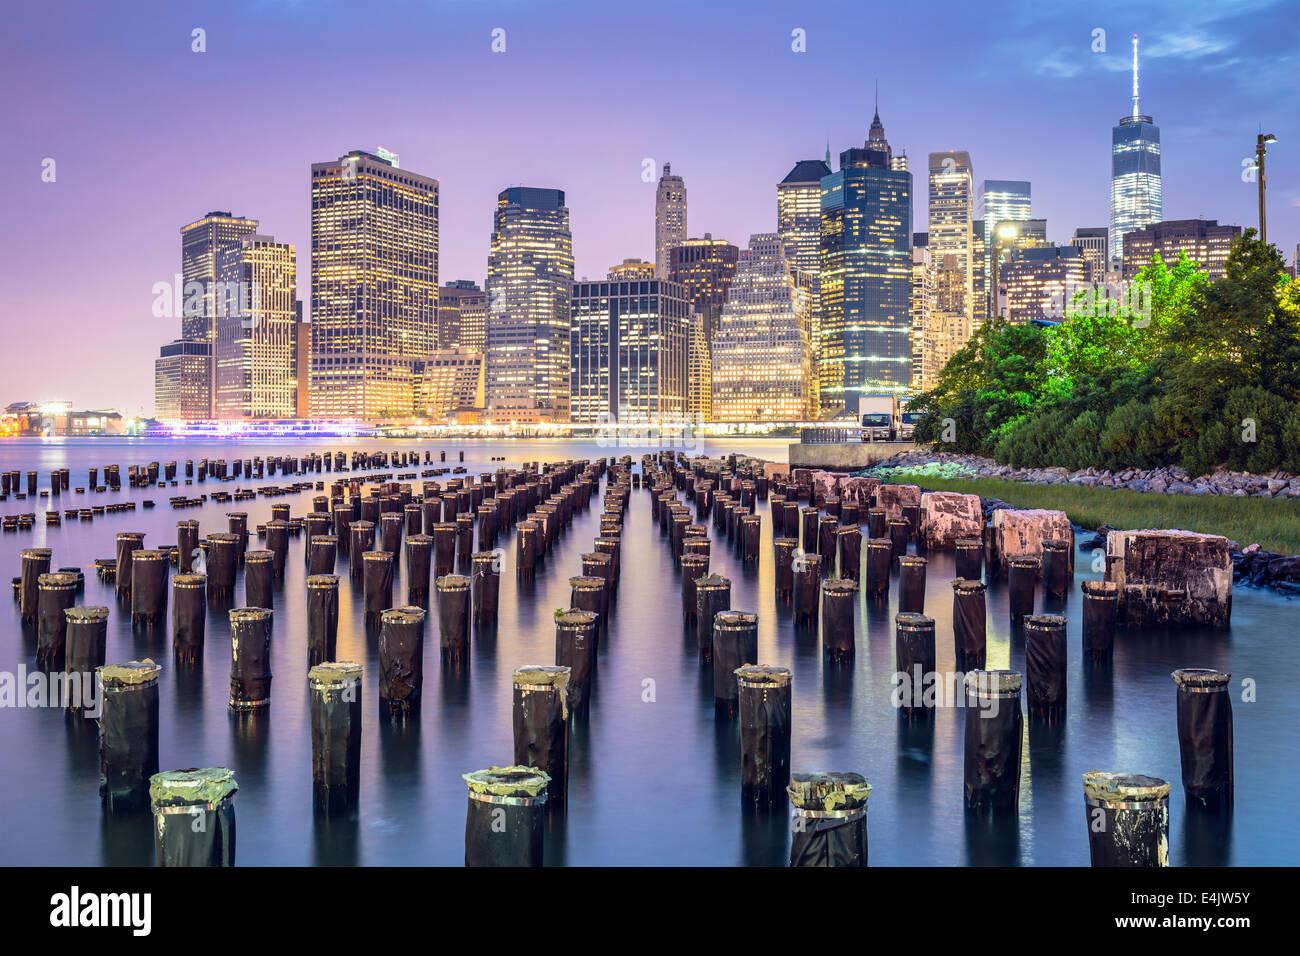 La ville de New York, USA skyline at night. Photo Stock